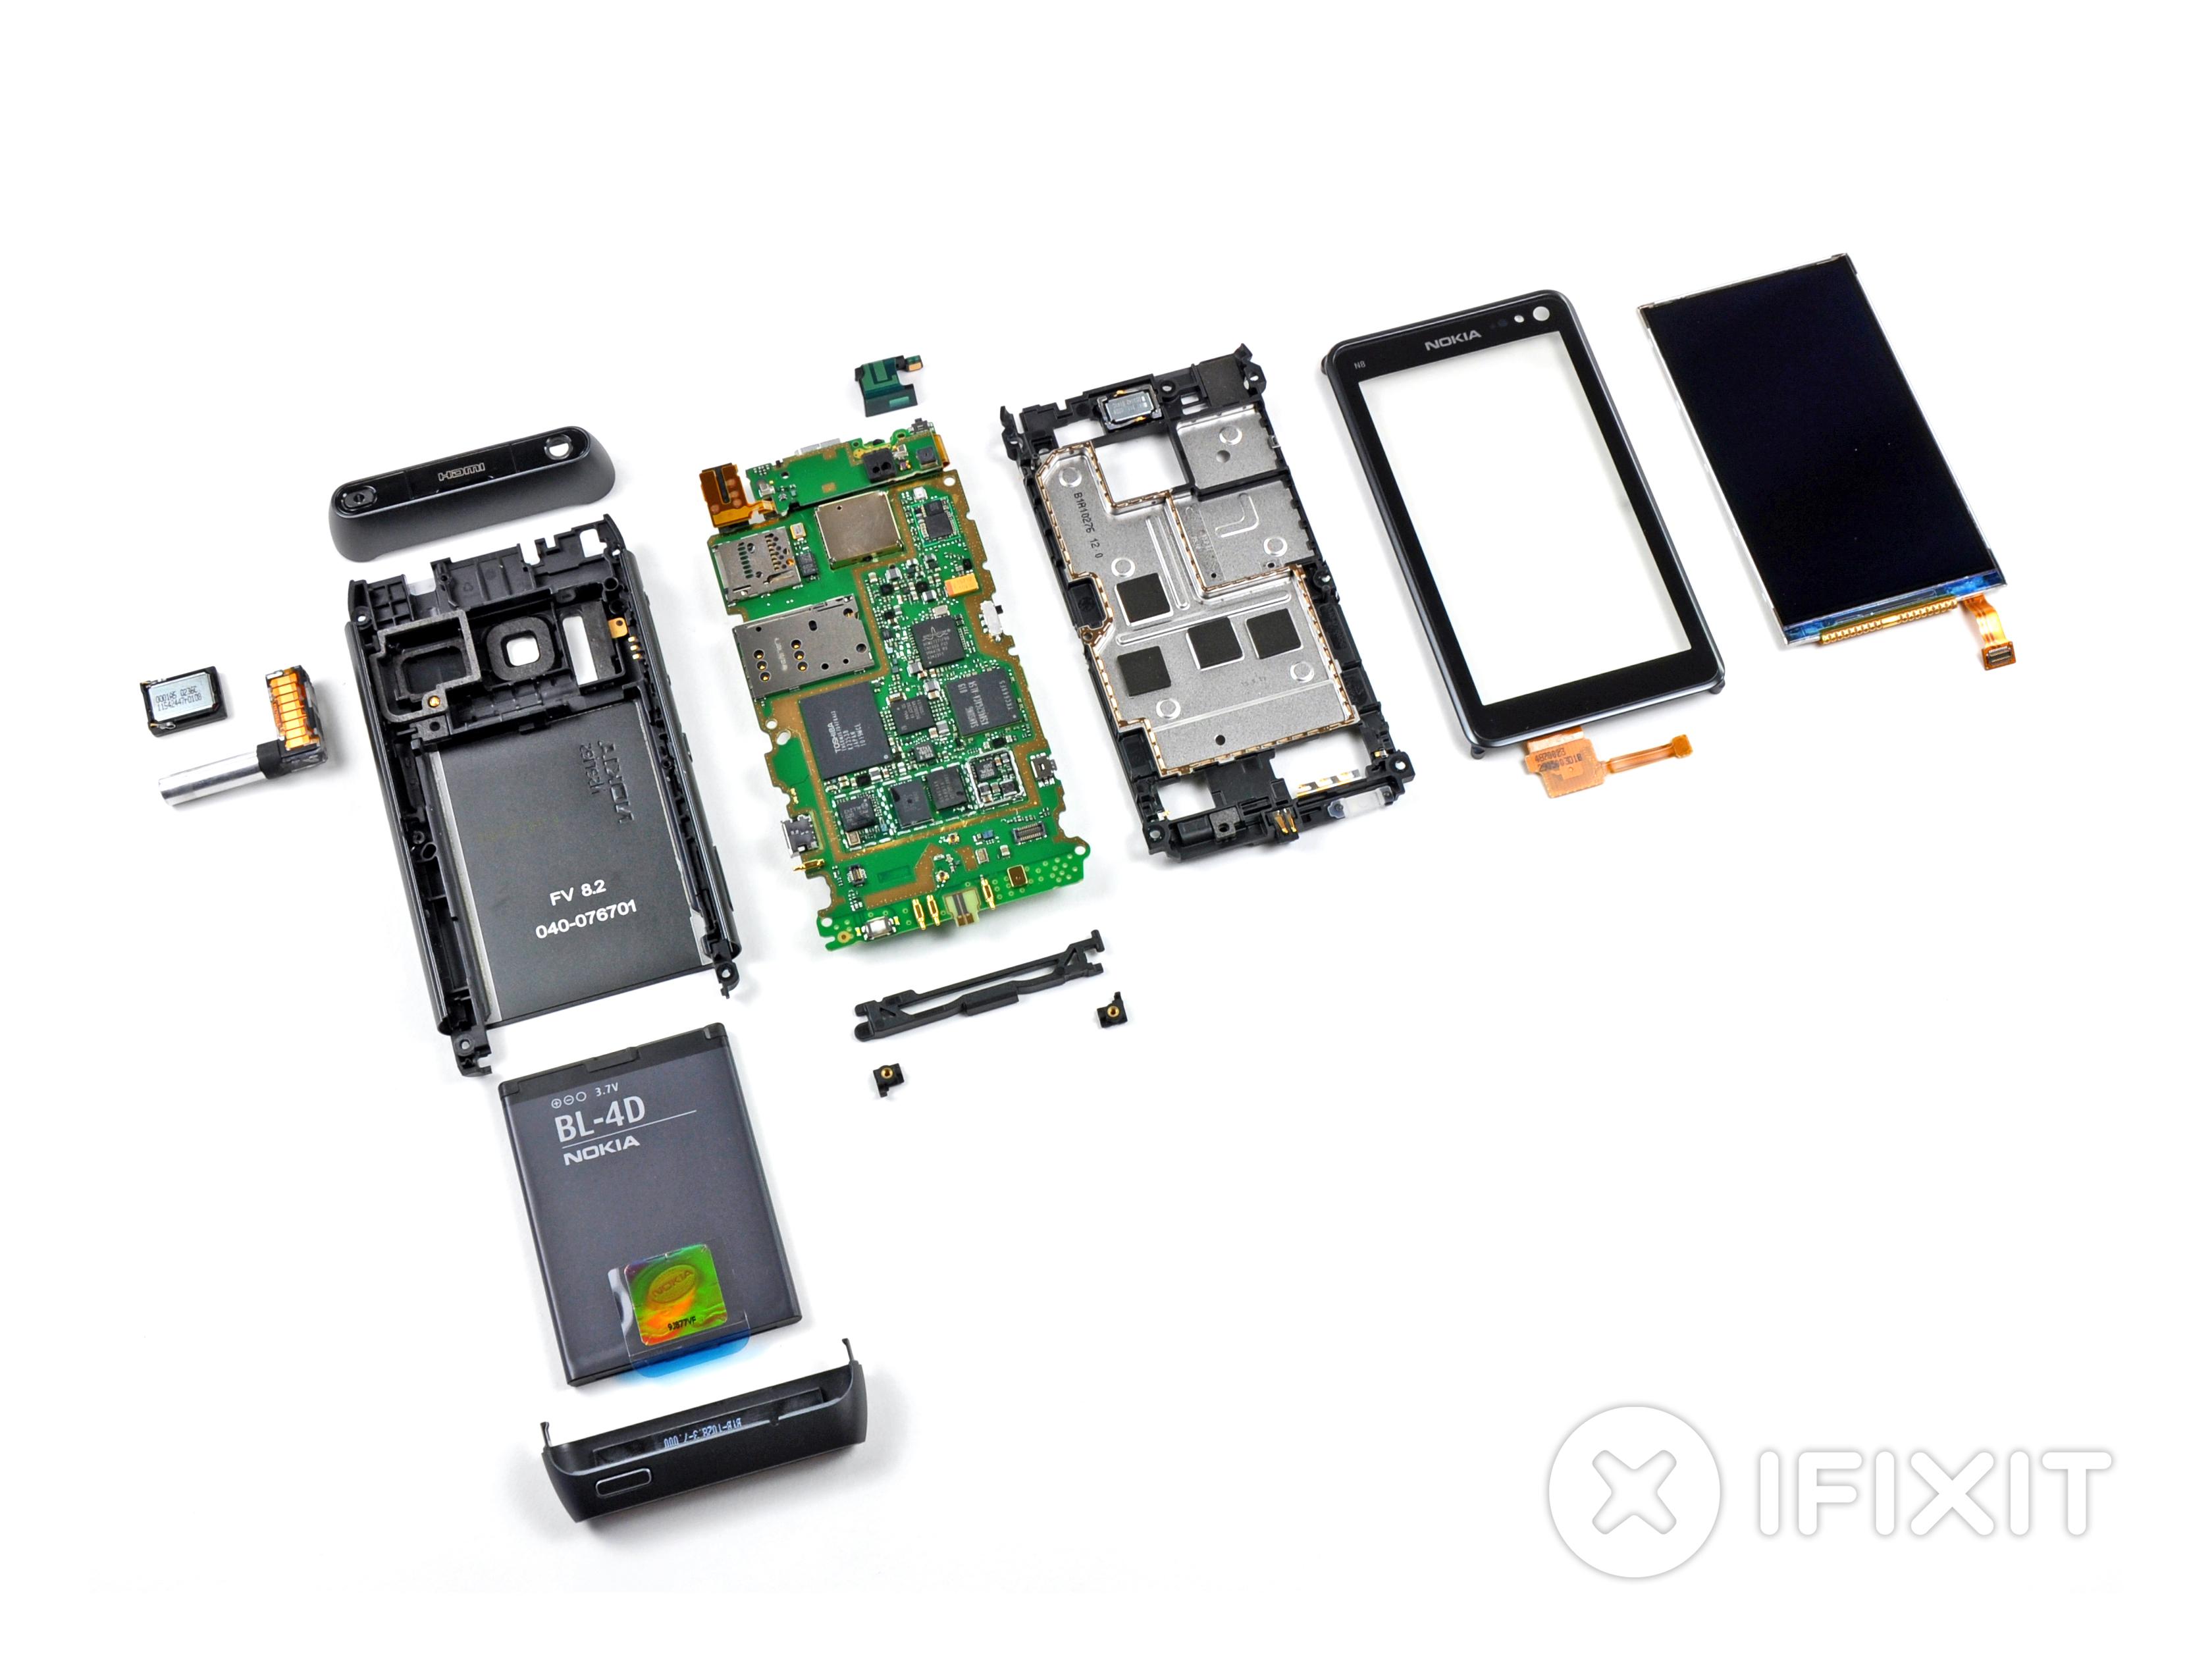 nokia n8 teardown ifixit rh ifixit com nokia n8-00 service manual Nokia 7